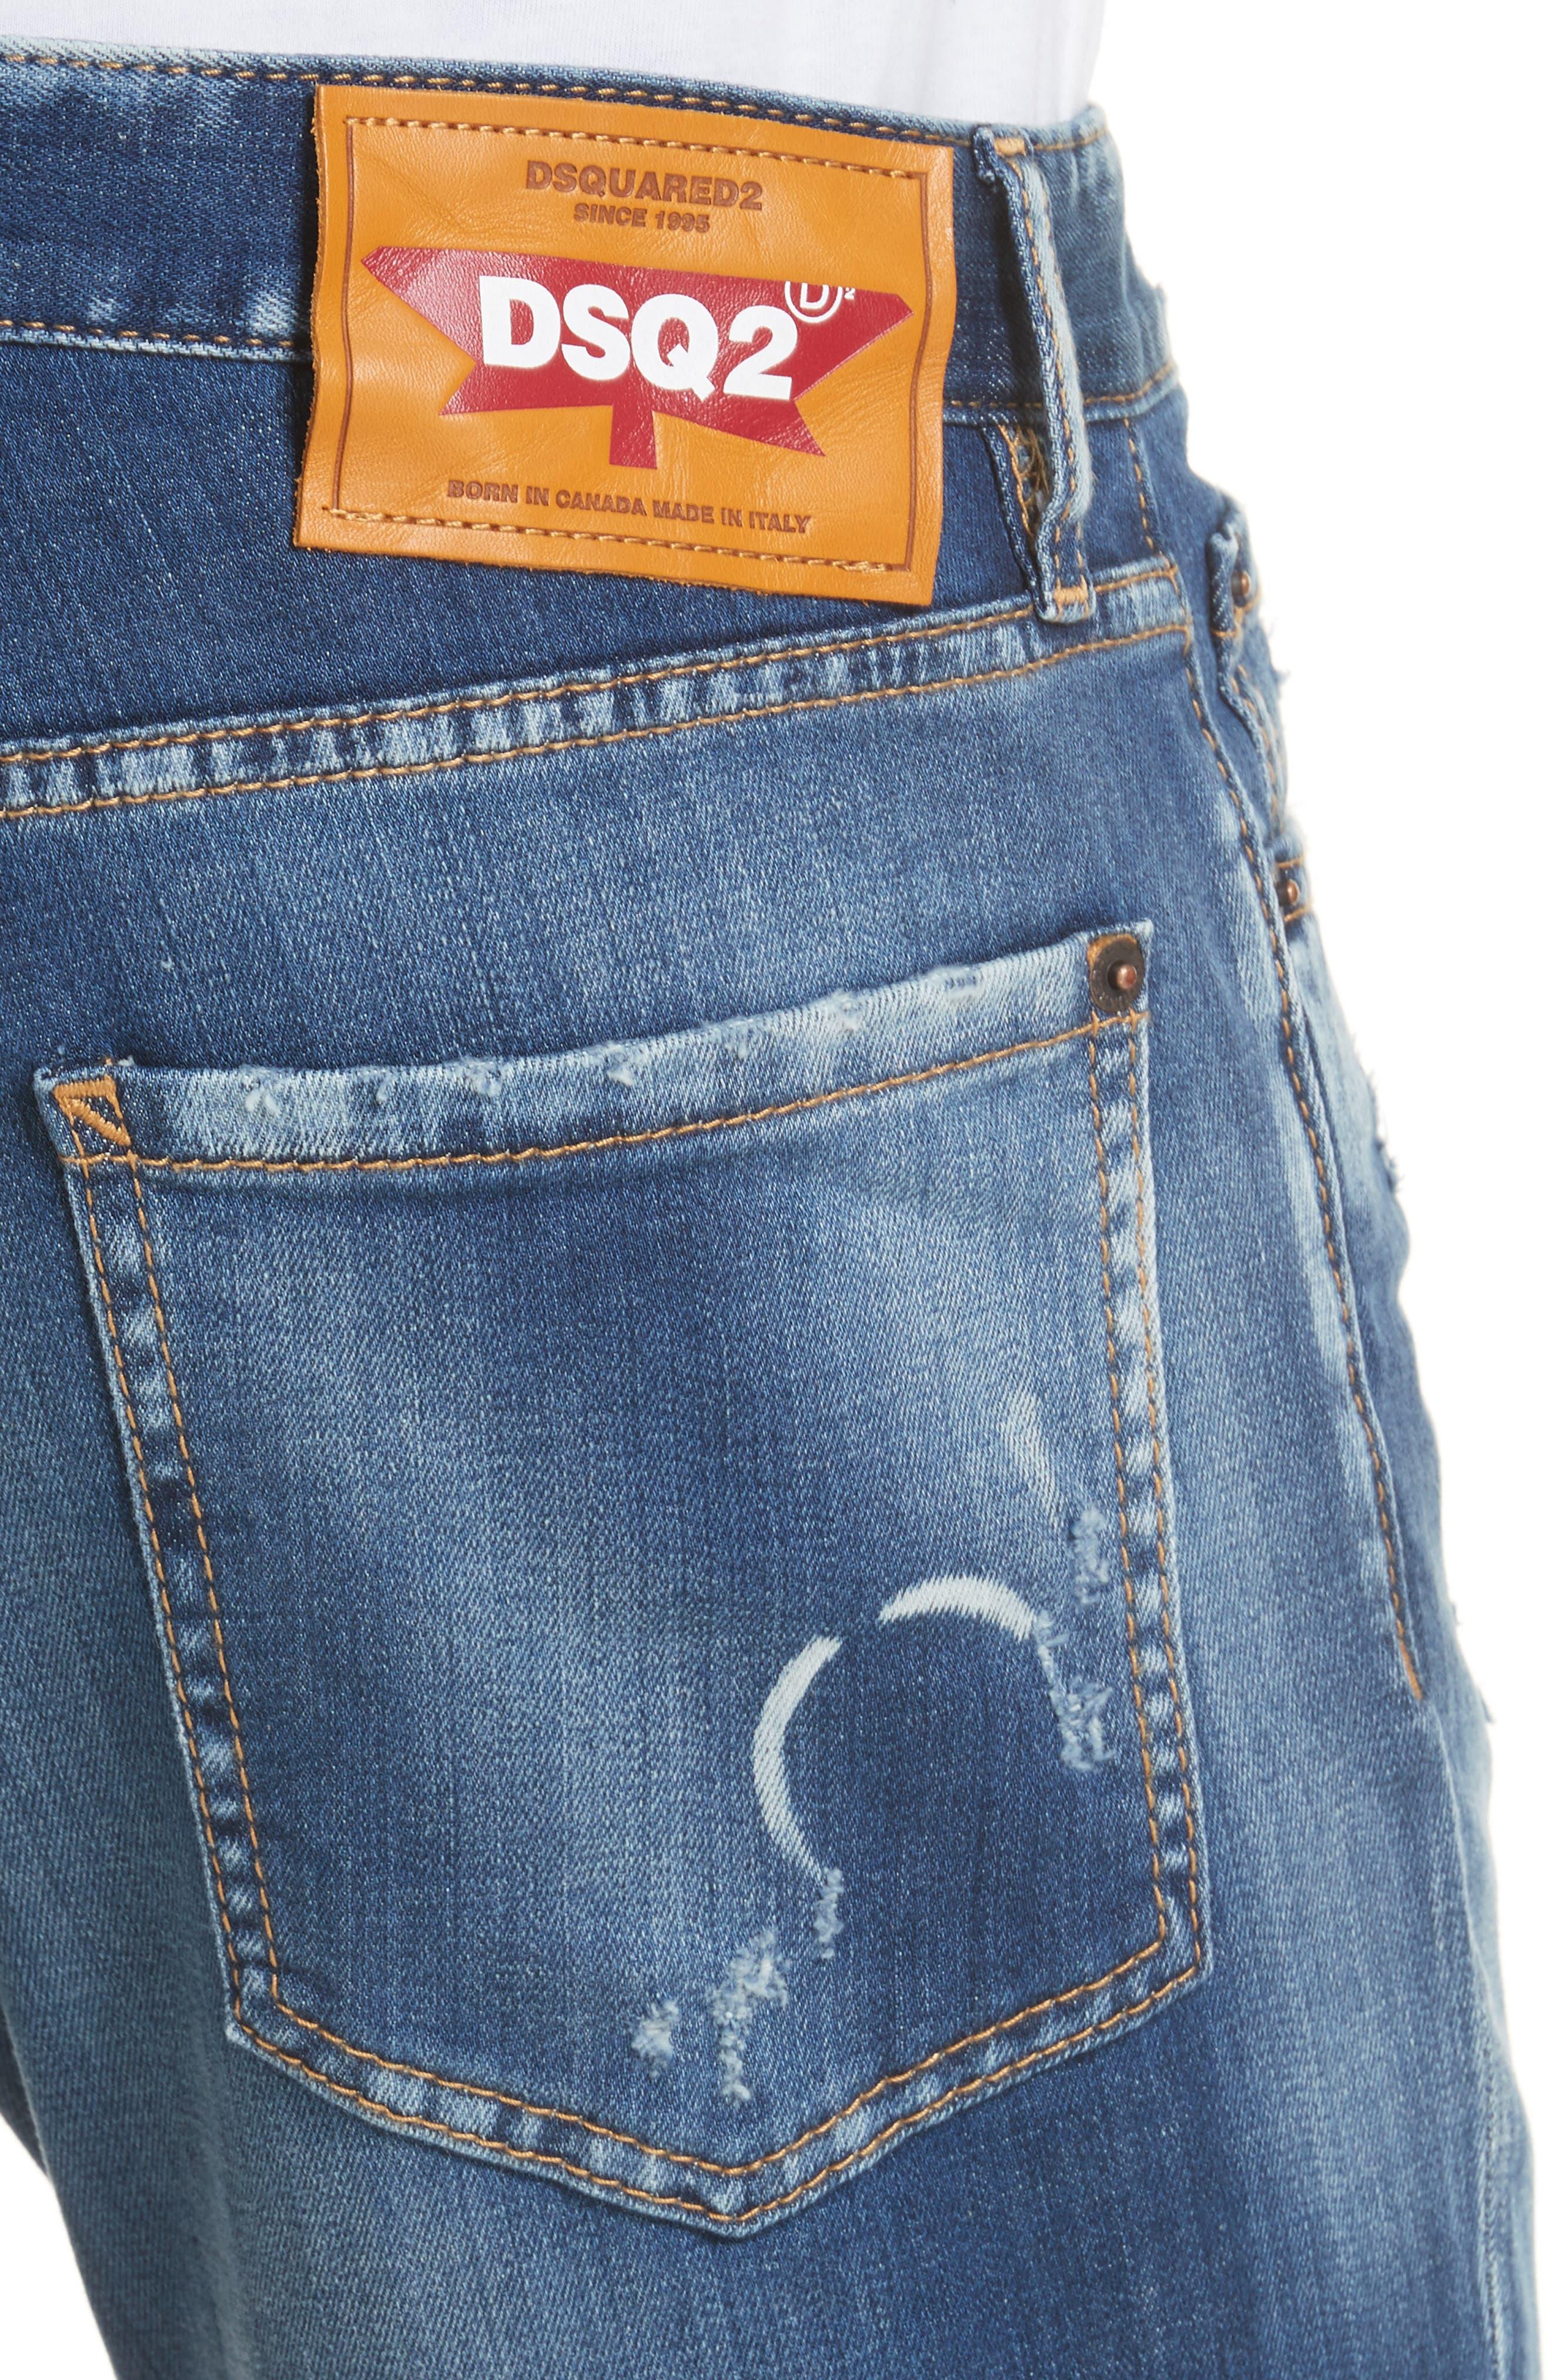 Slim Fit Medium Wash Jeans,                             Alternate thumbnail 4, color,                             Navy/Blue